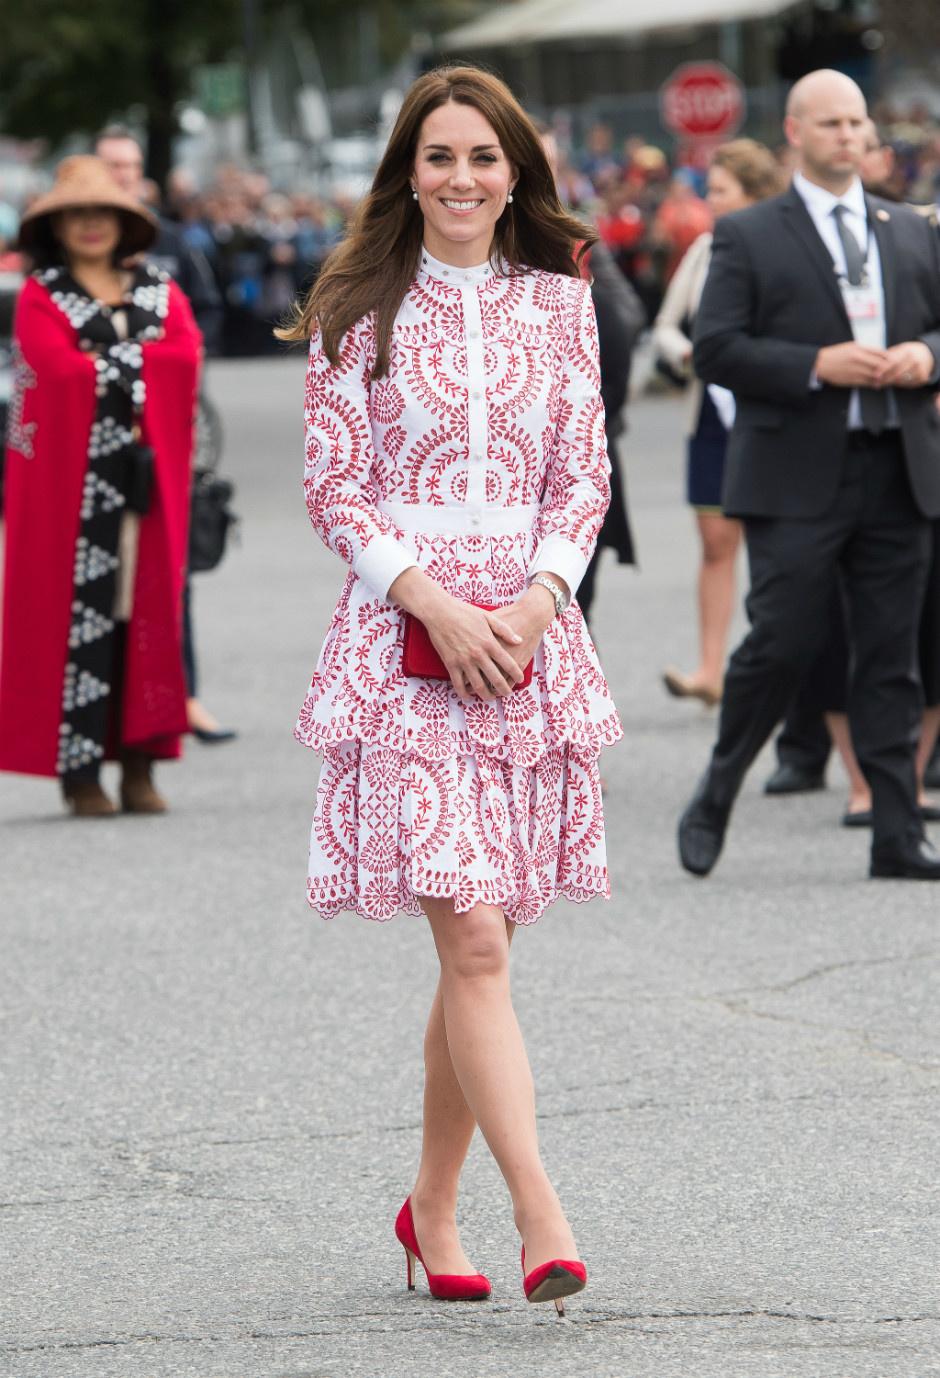 10 раз, когда Кейт Миддлтон пренебрегла королевским дресс-кодом фото [11]